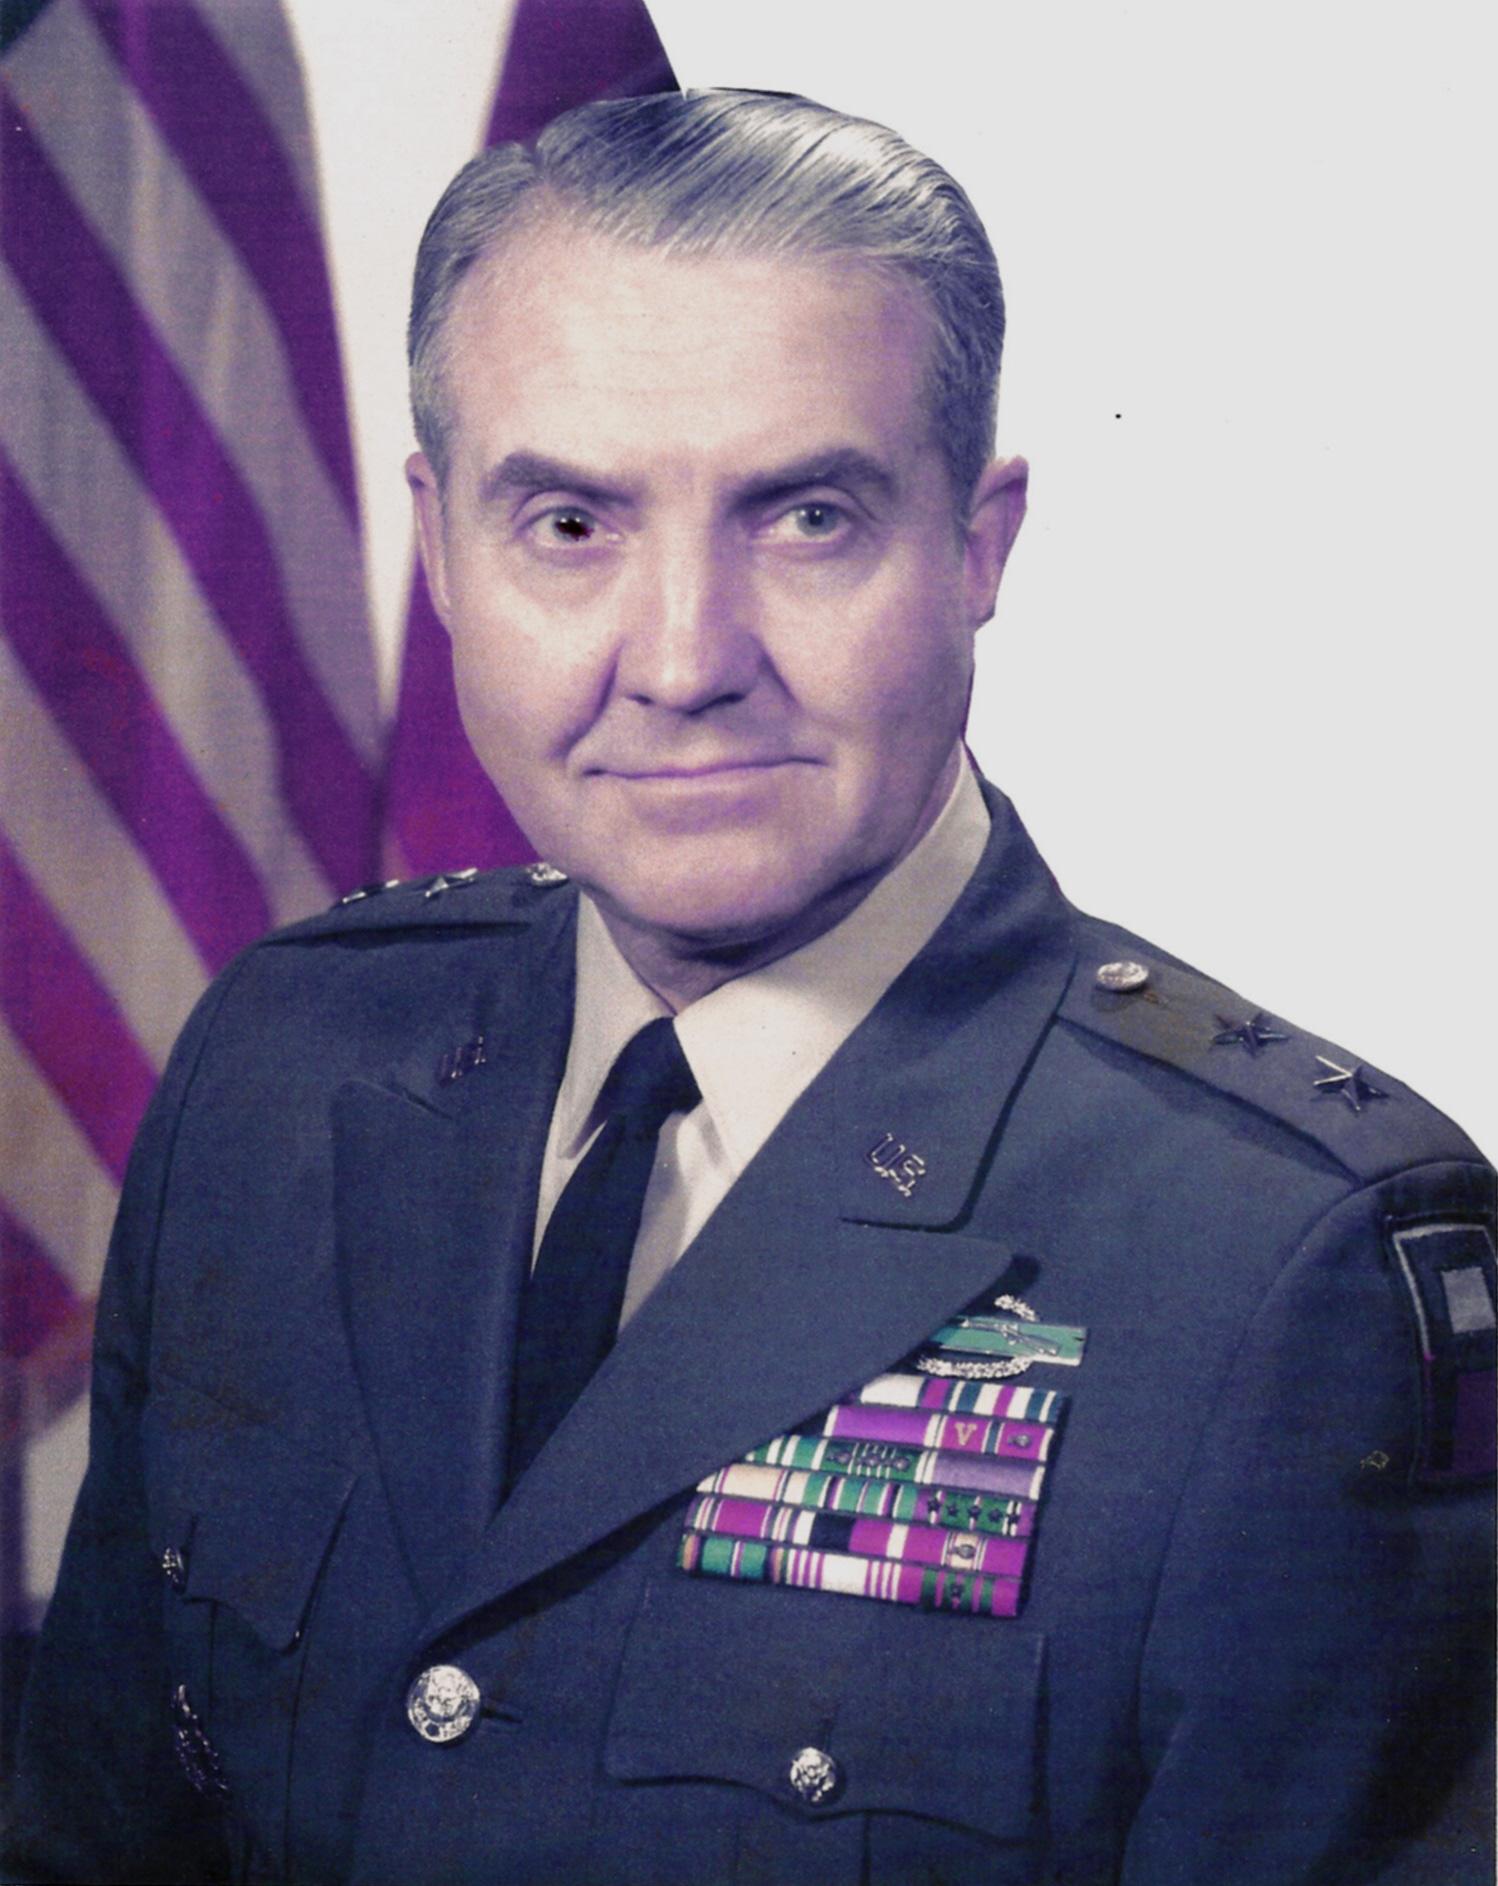 Major General William H. Blakefield